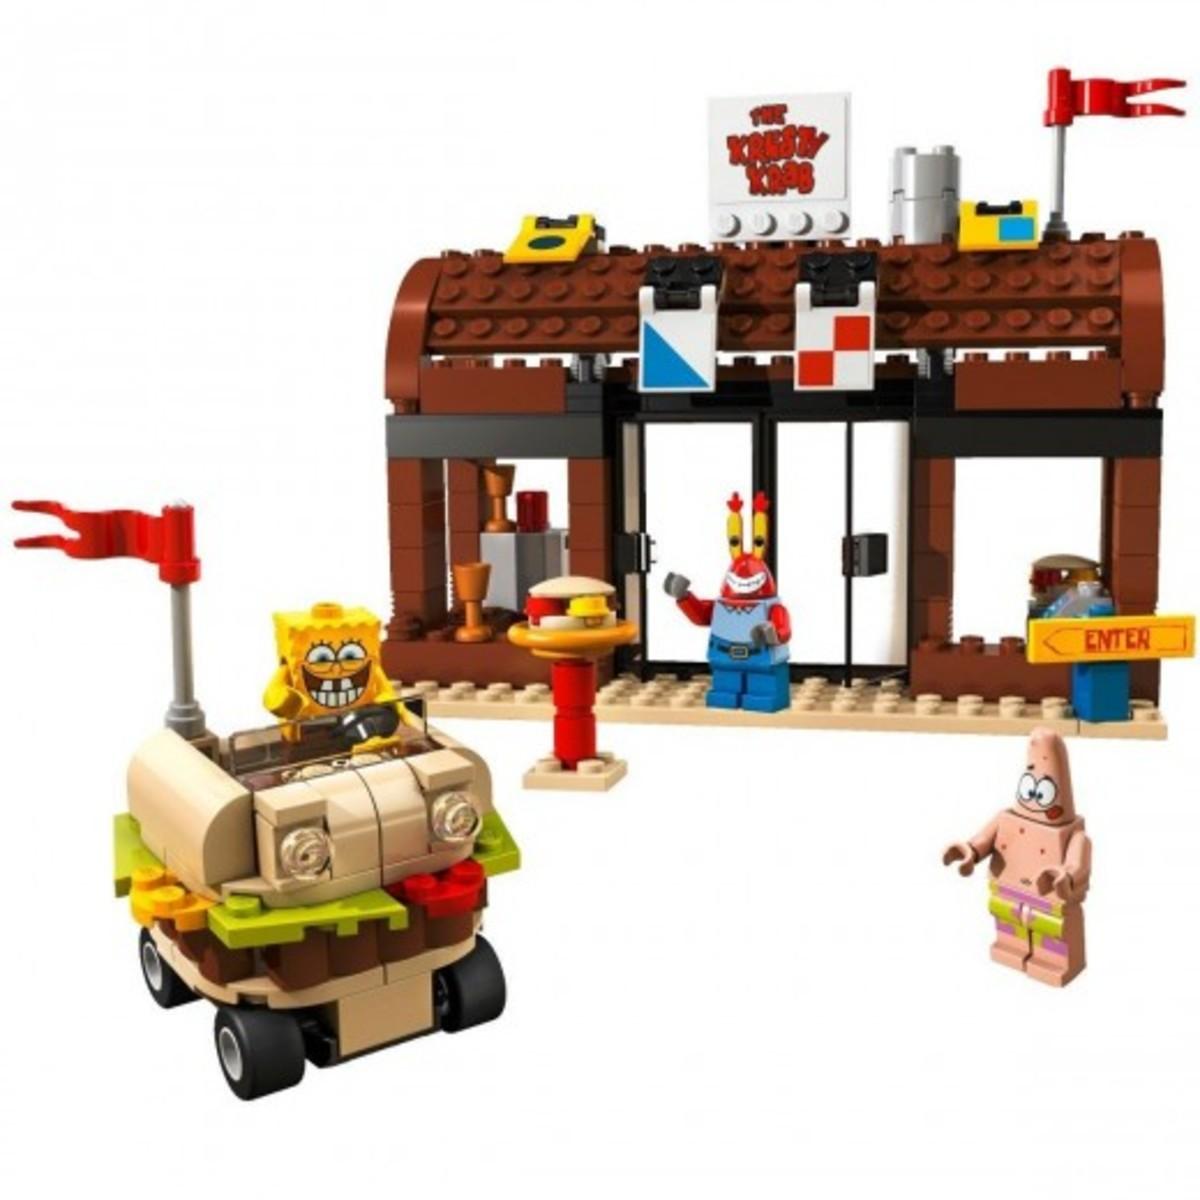 LEGO SpongBob SquarePants Krusty Krab Adventures 3833 Assembled